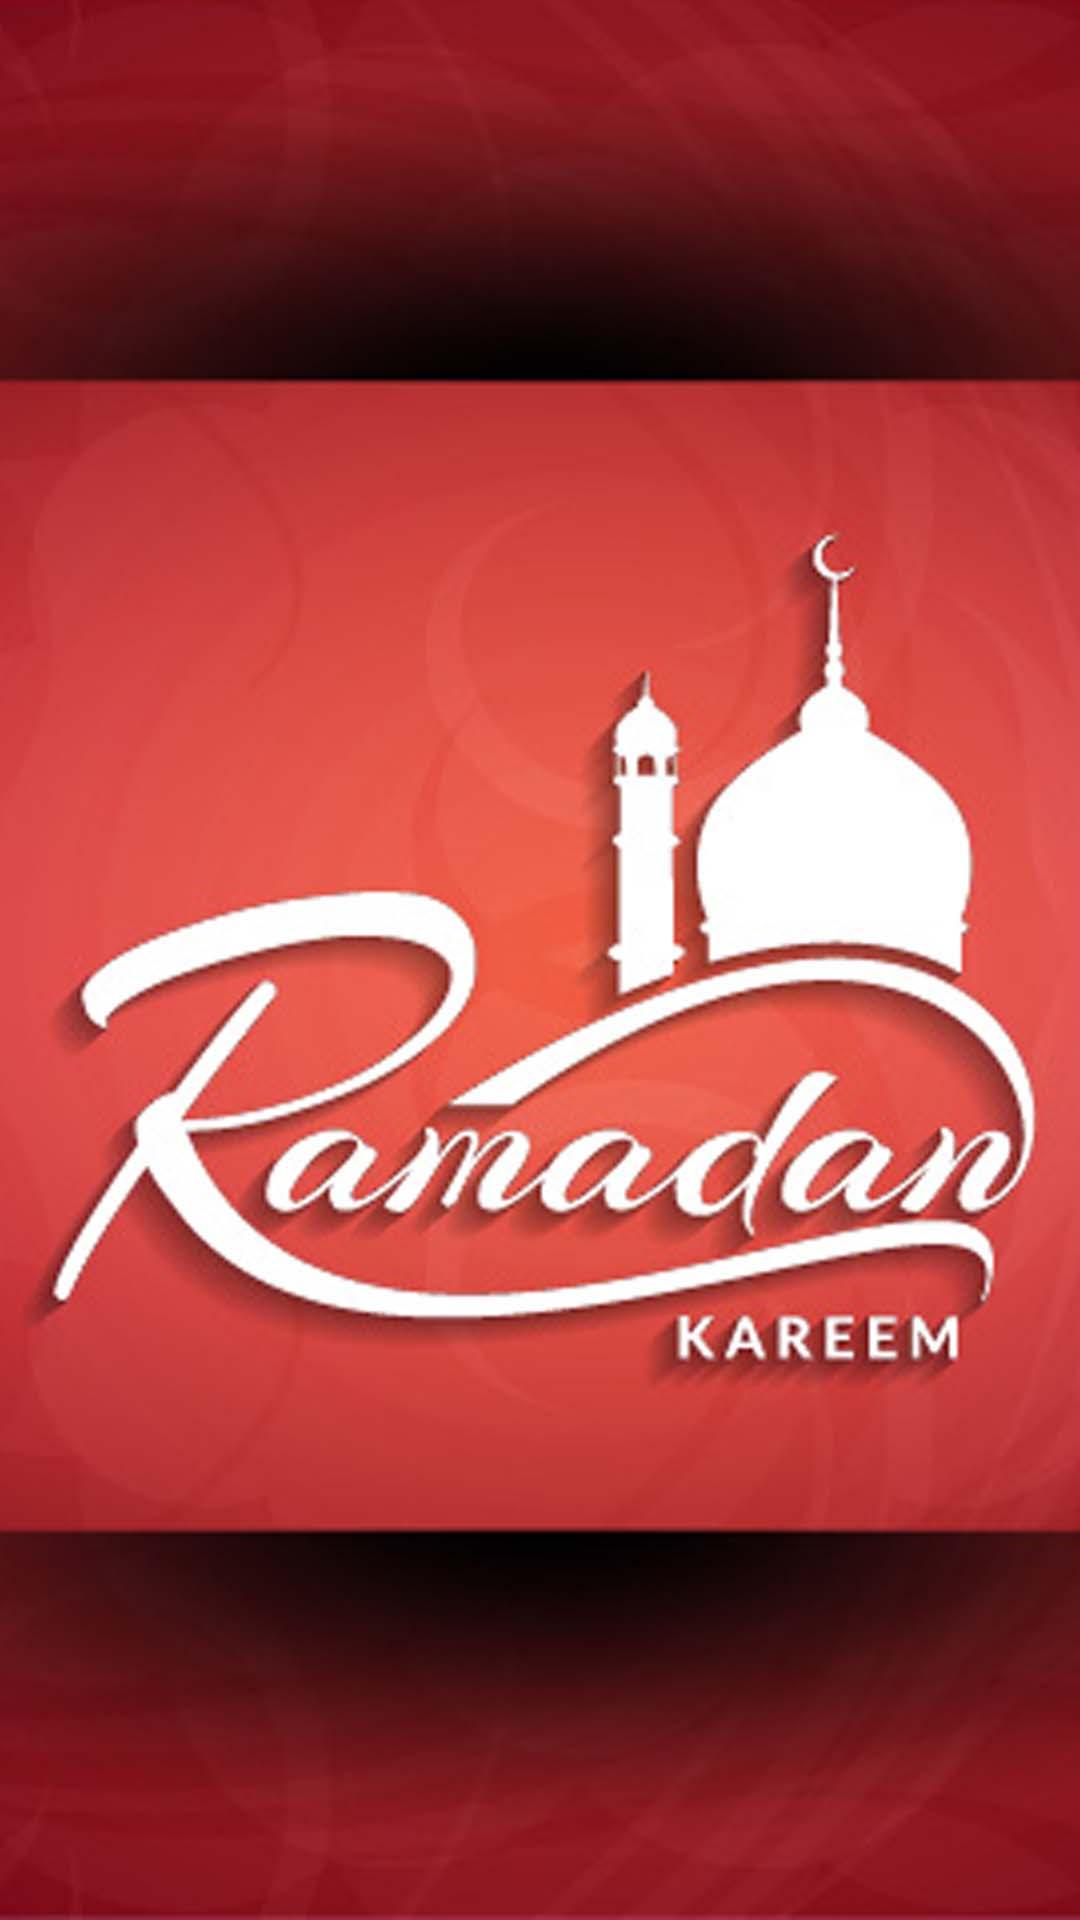 خلفيات موبايل رمضان كريم Mobile Wallpapers HD 2 خلفيات موبايل رمضان كريم Mobile Wallpapers HD